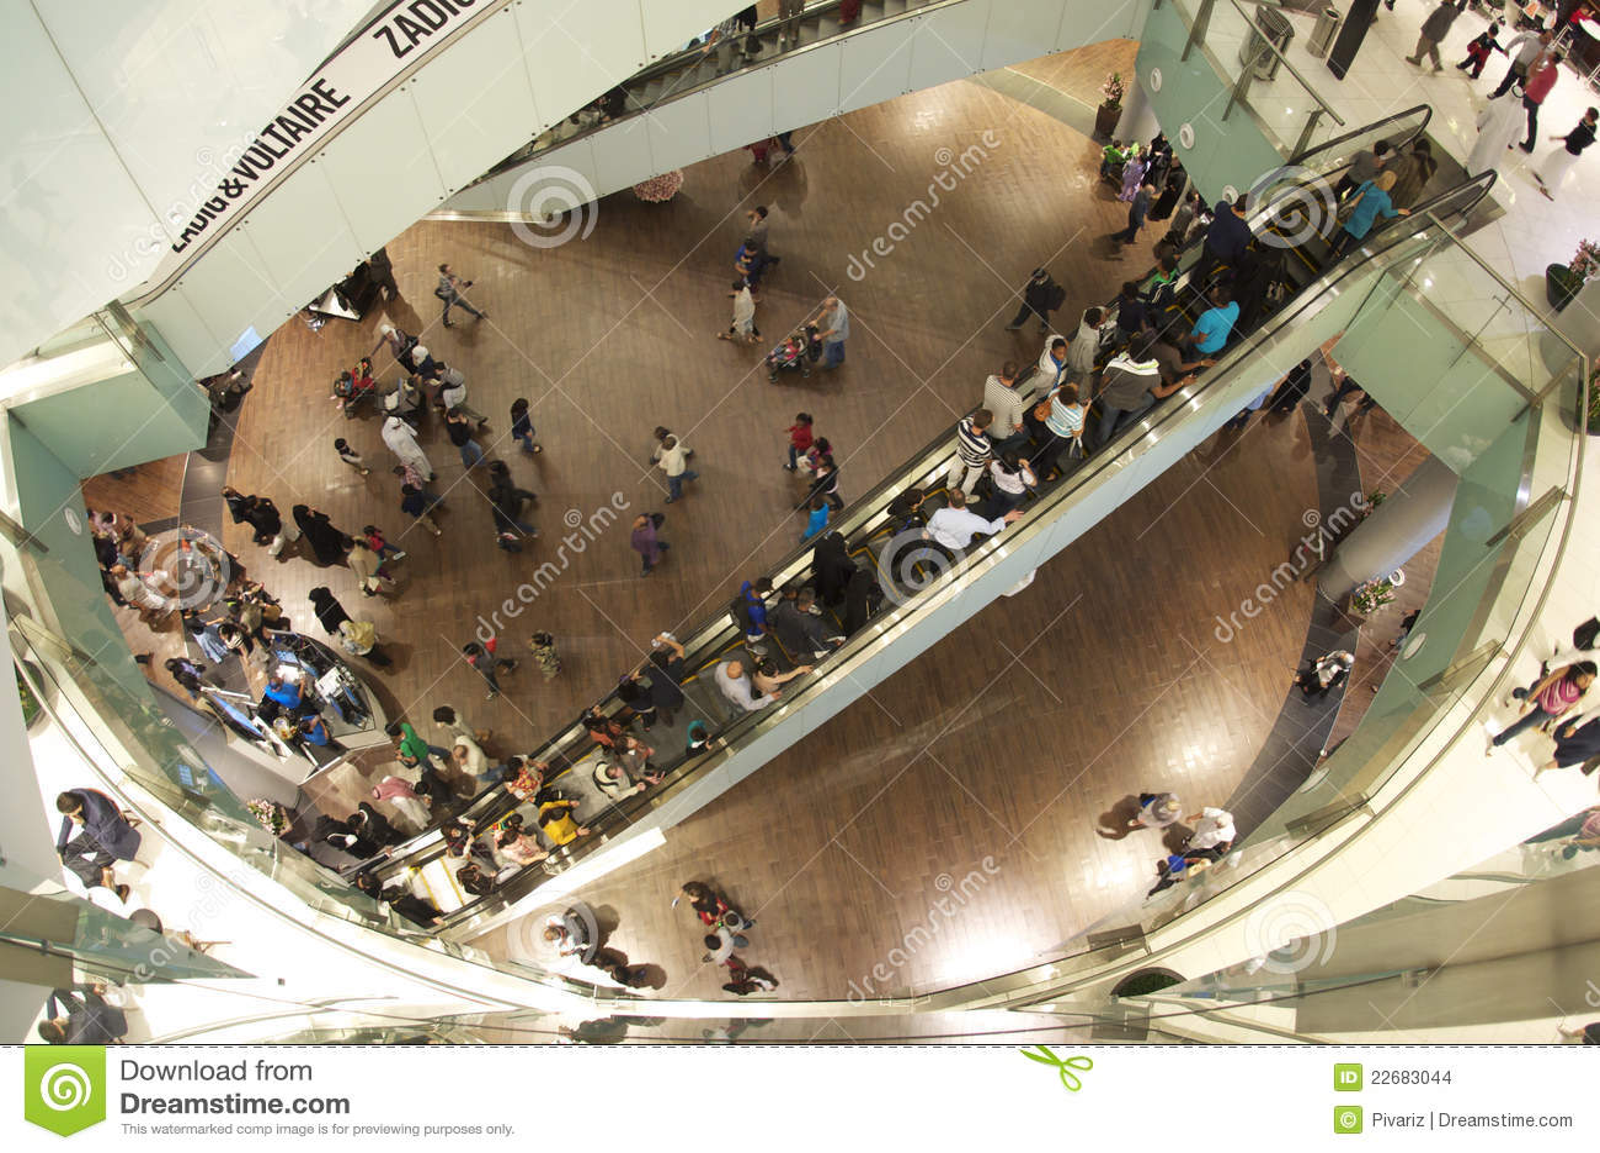 Dubai shopping festival at the dubai mall